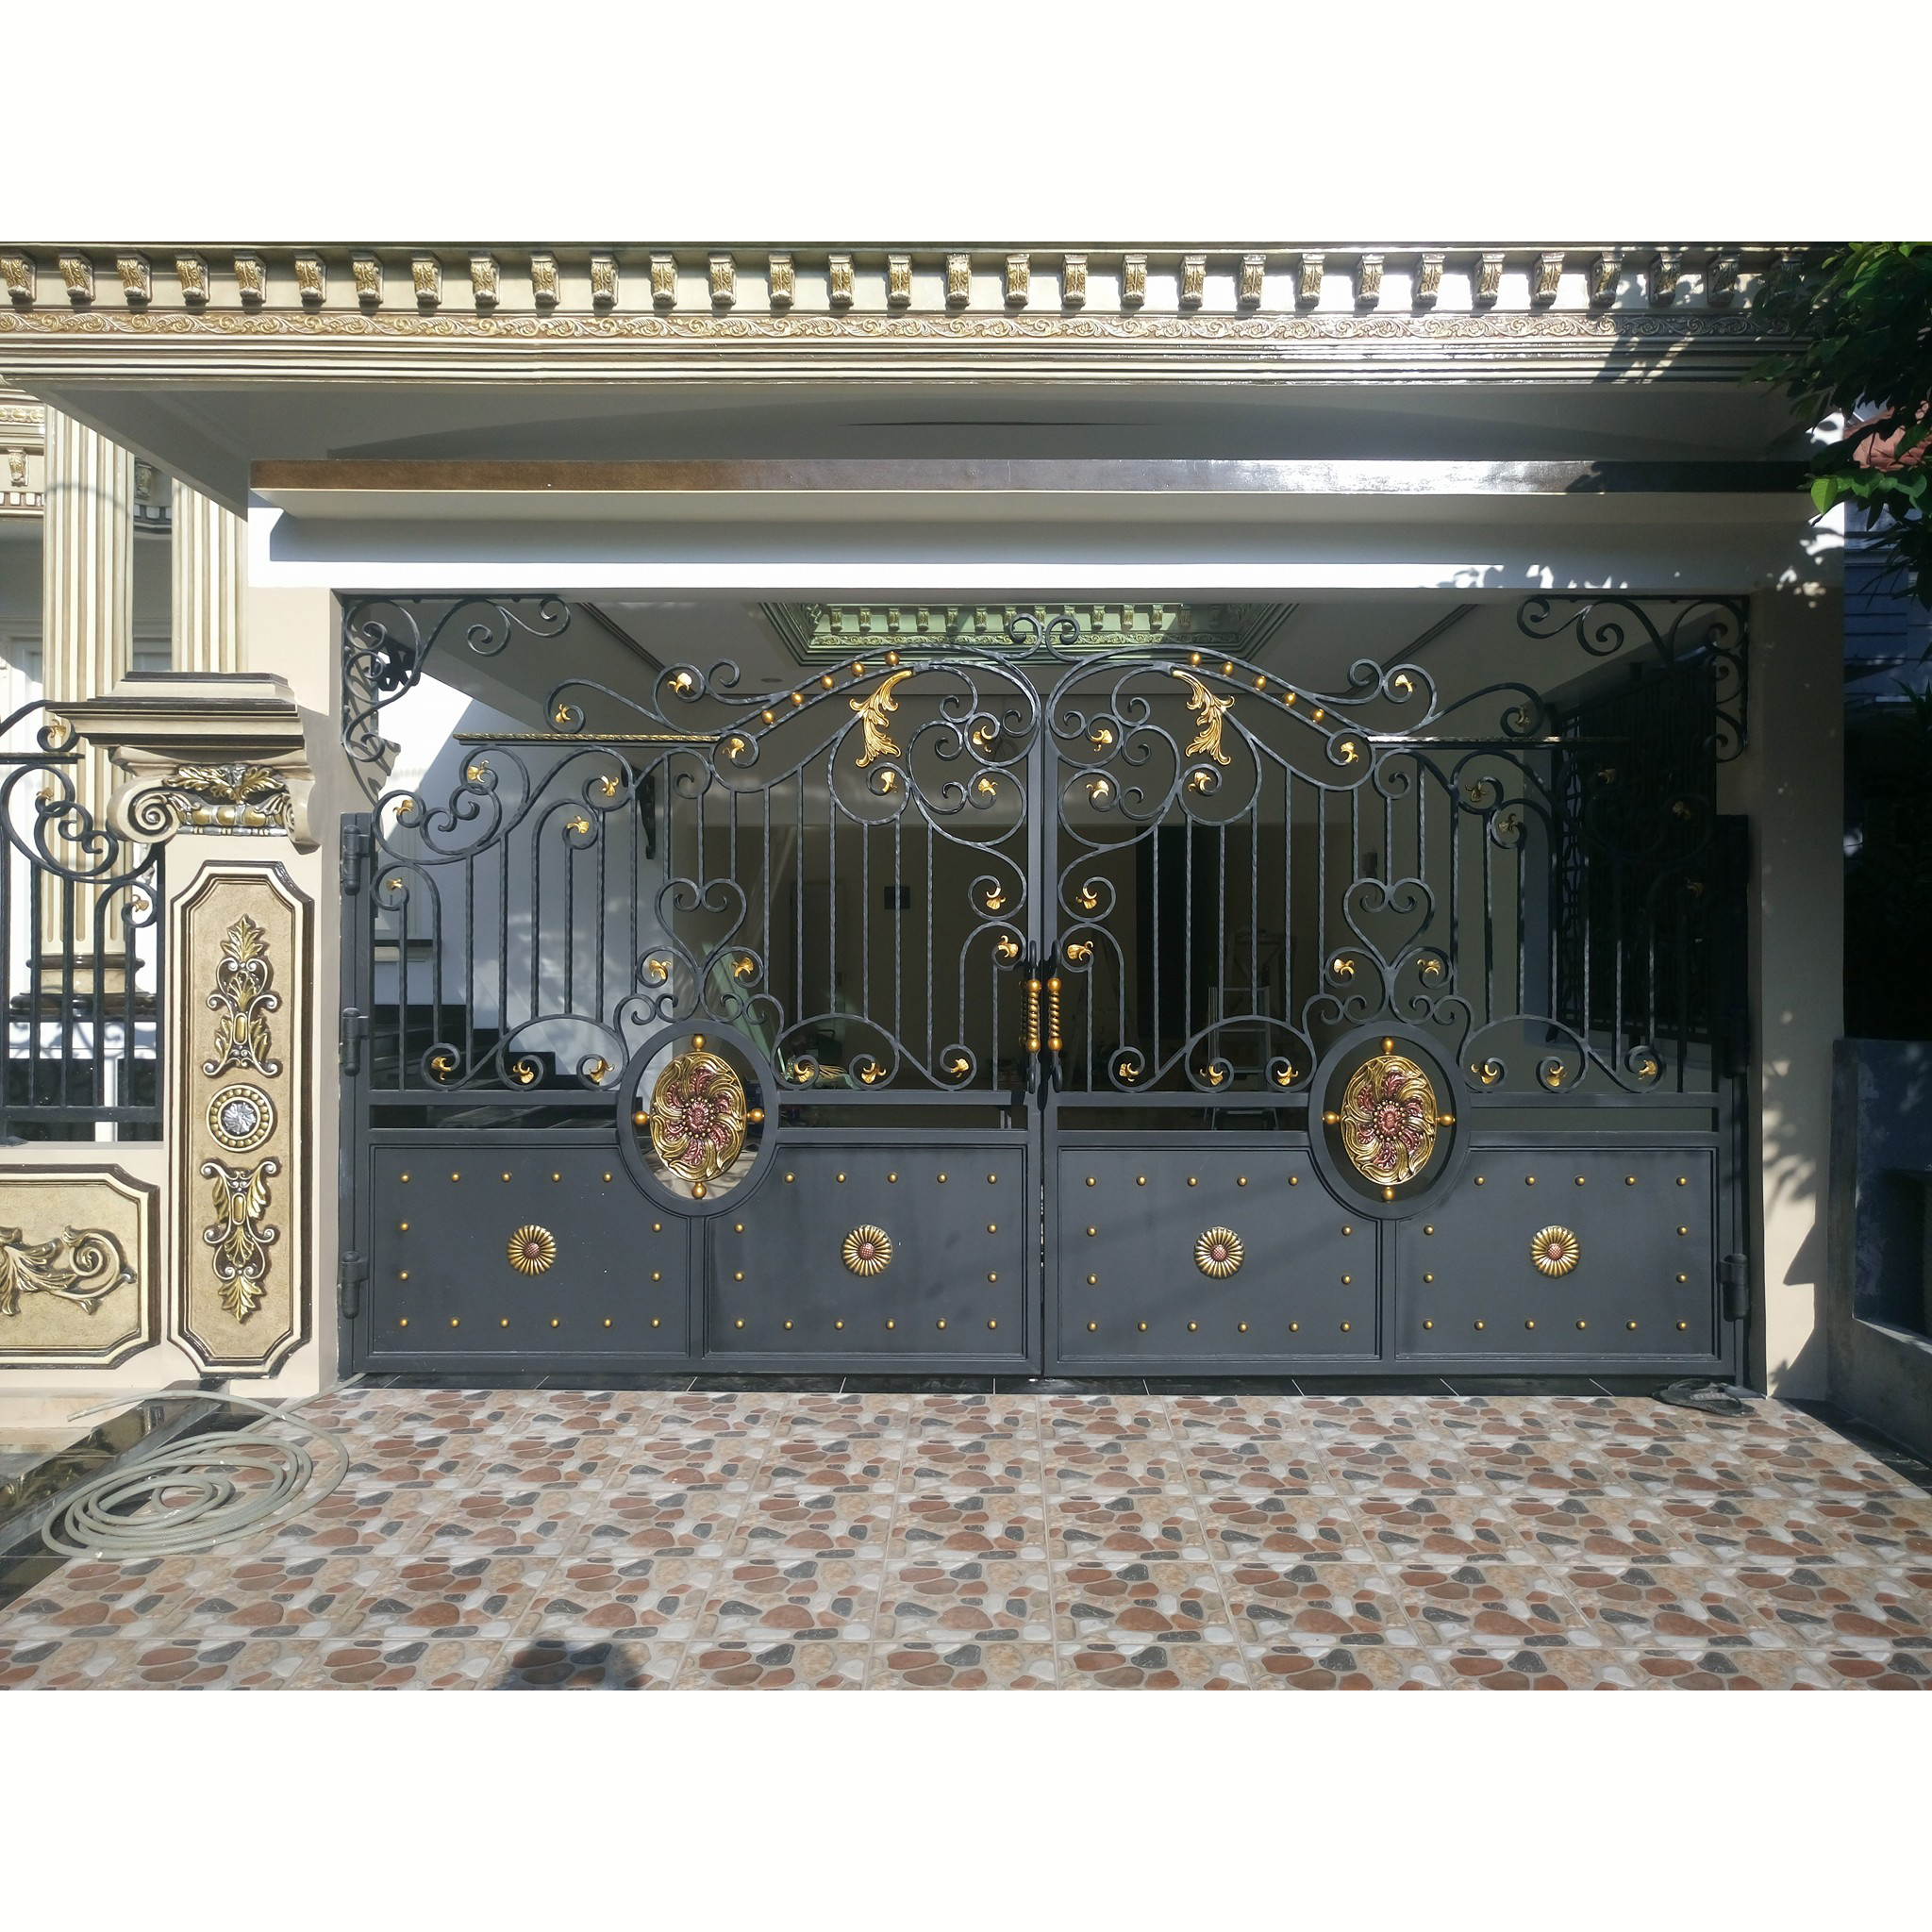 Main Iron Manual Swing Fence Gate Buy Main Iron Gate Manual Swing Gate Iron Fence Gate Product On Alibaba Com